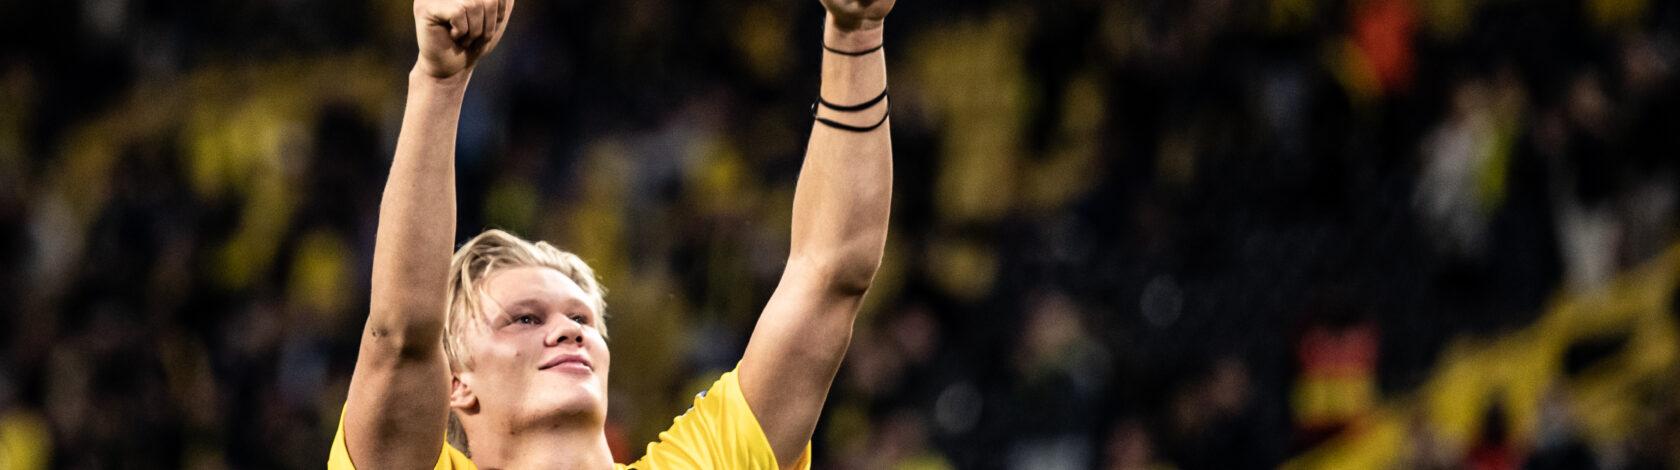 Borussia Dortmund v Borussia Mönchengladbach – Bundesliga for DFL